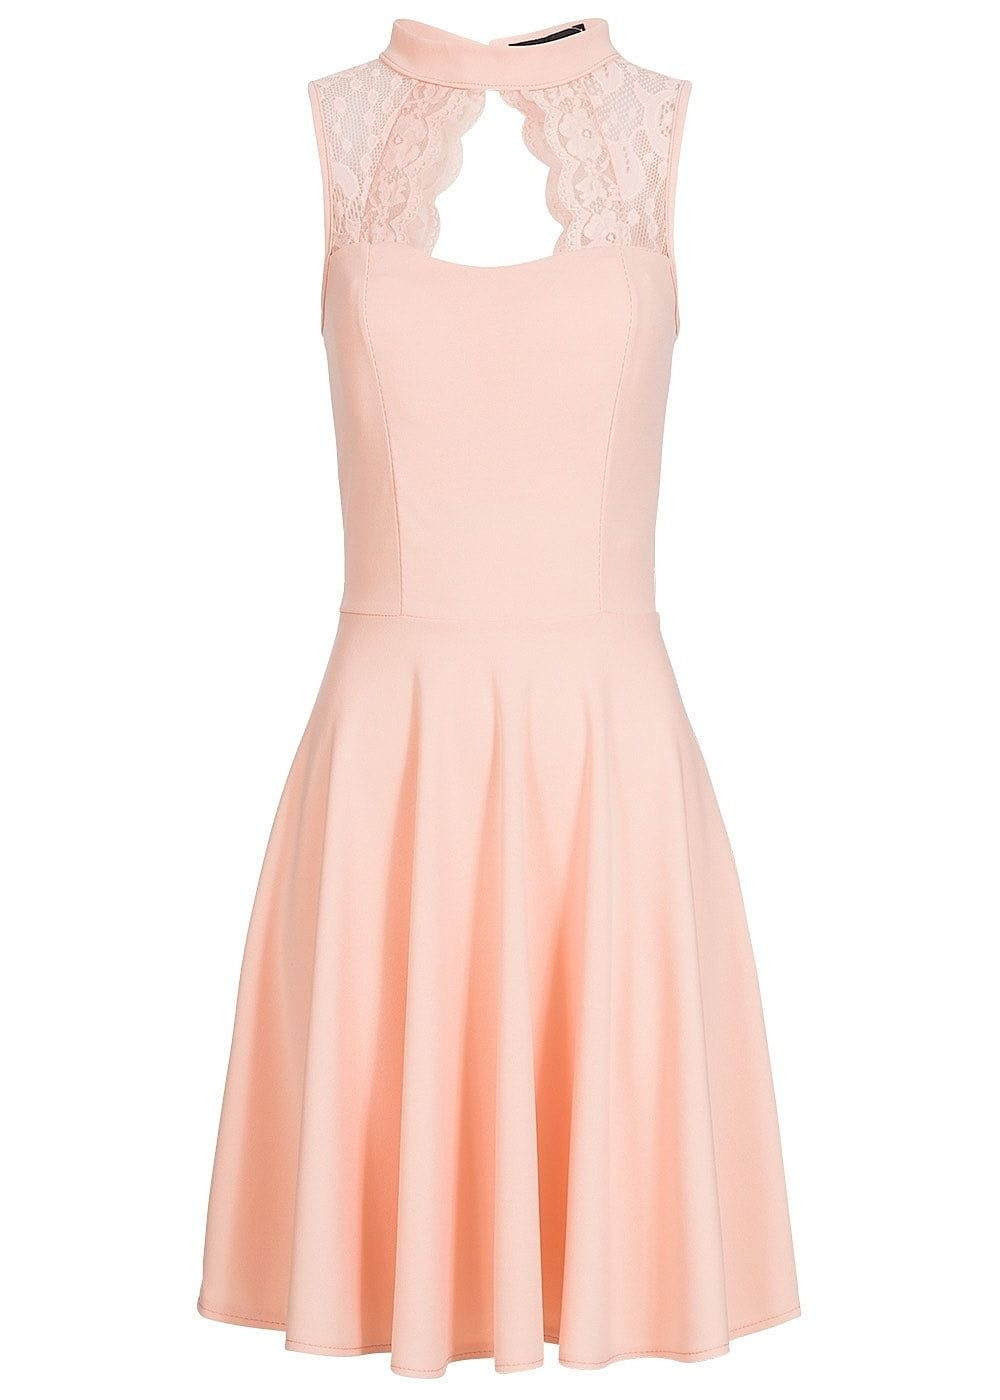 Designer Wunderbar Rosa Kleid Spitze Spezialgebiet15 Spektakulär Rosa Kleid Spitze Stylish